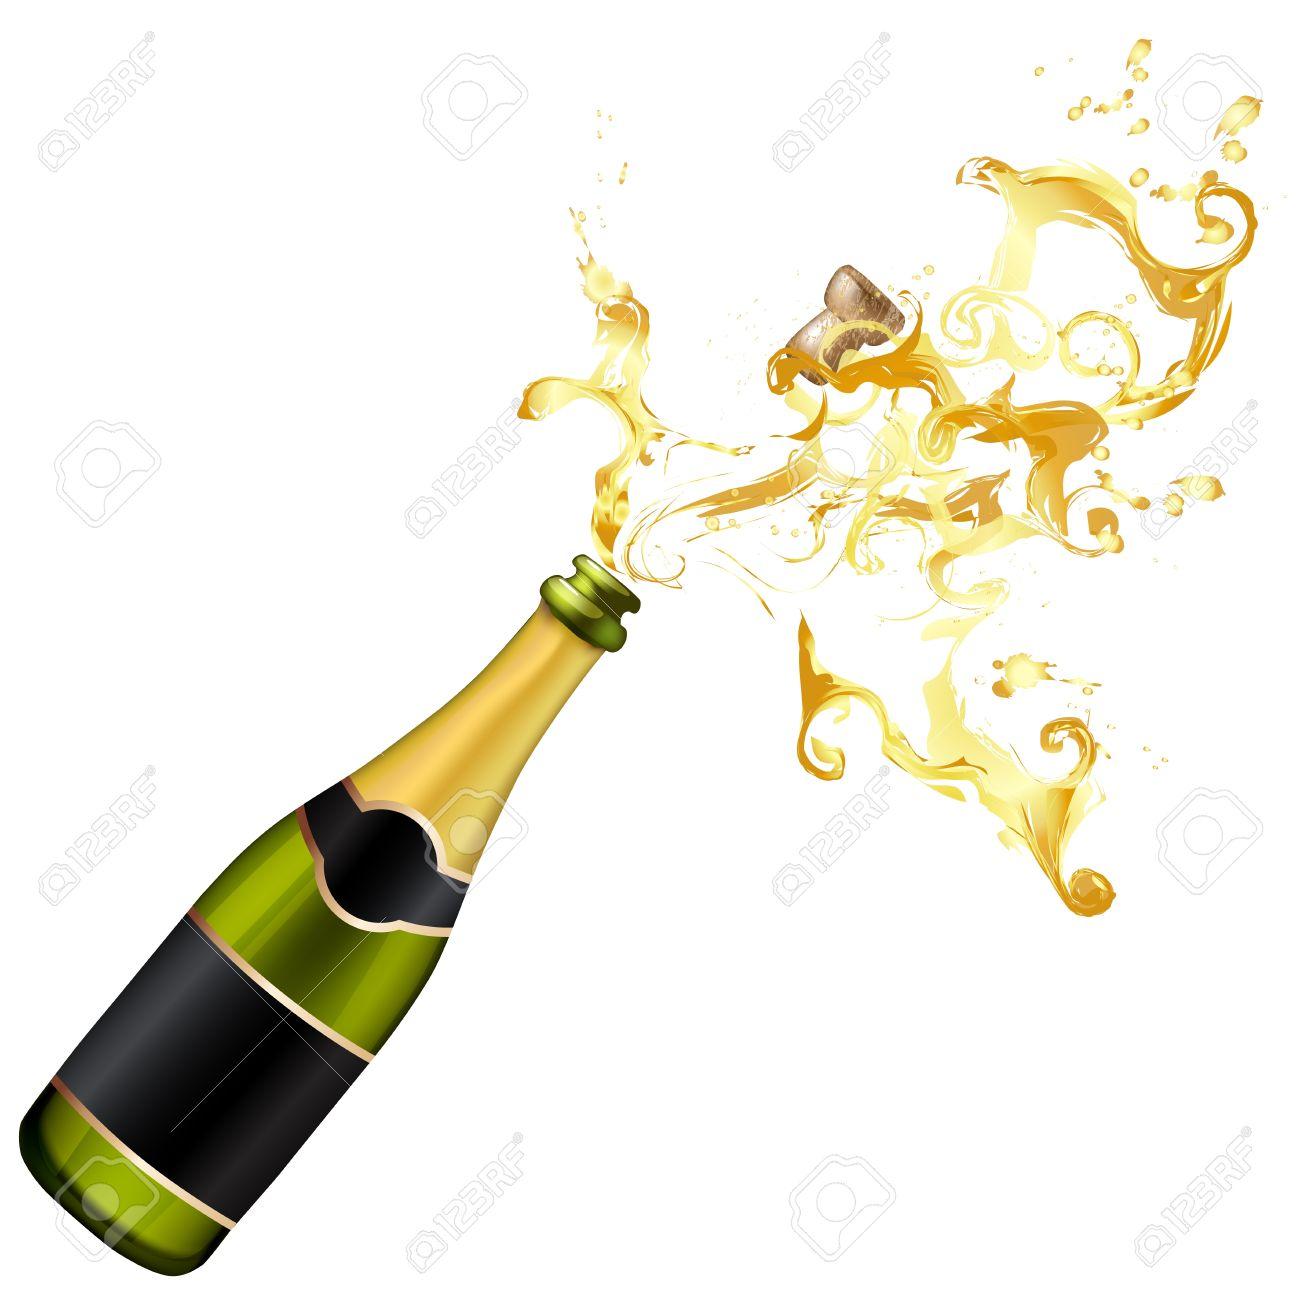 Champagne clipart cork Cork Illustration collection Champagne Champagne